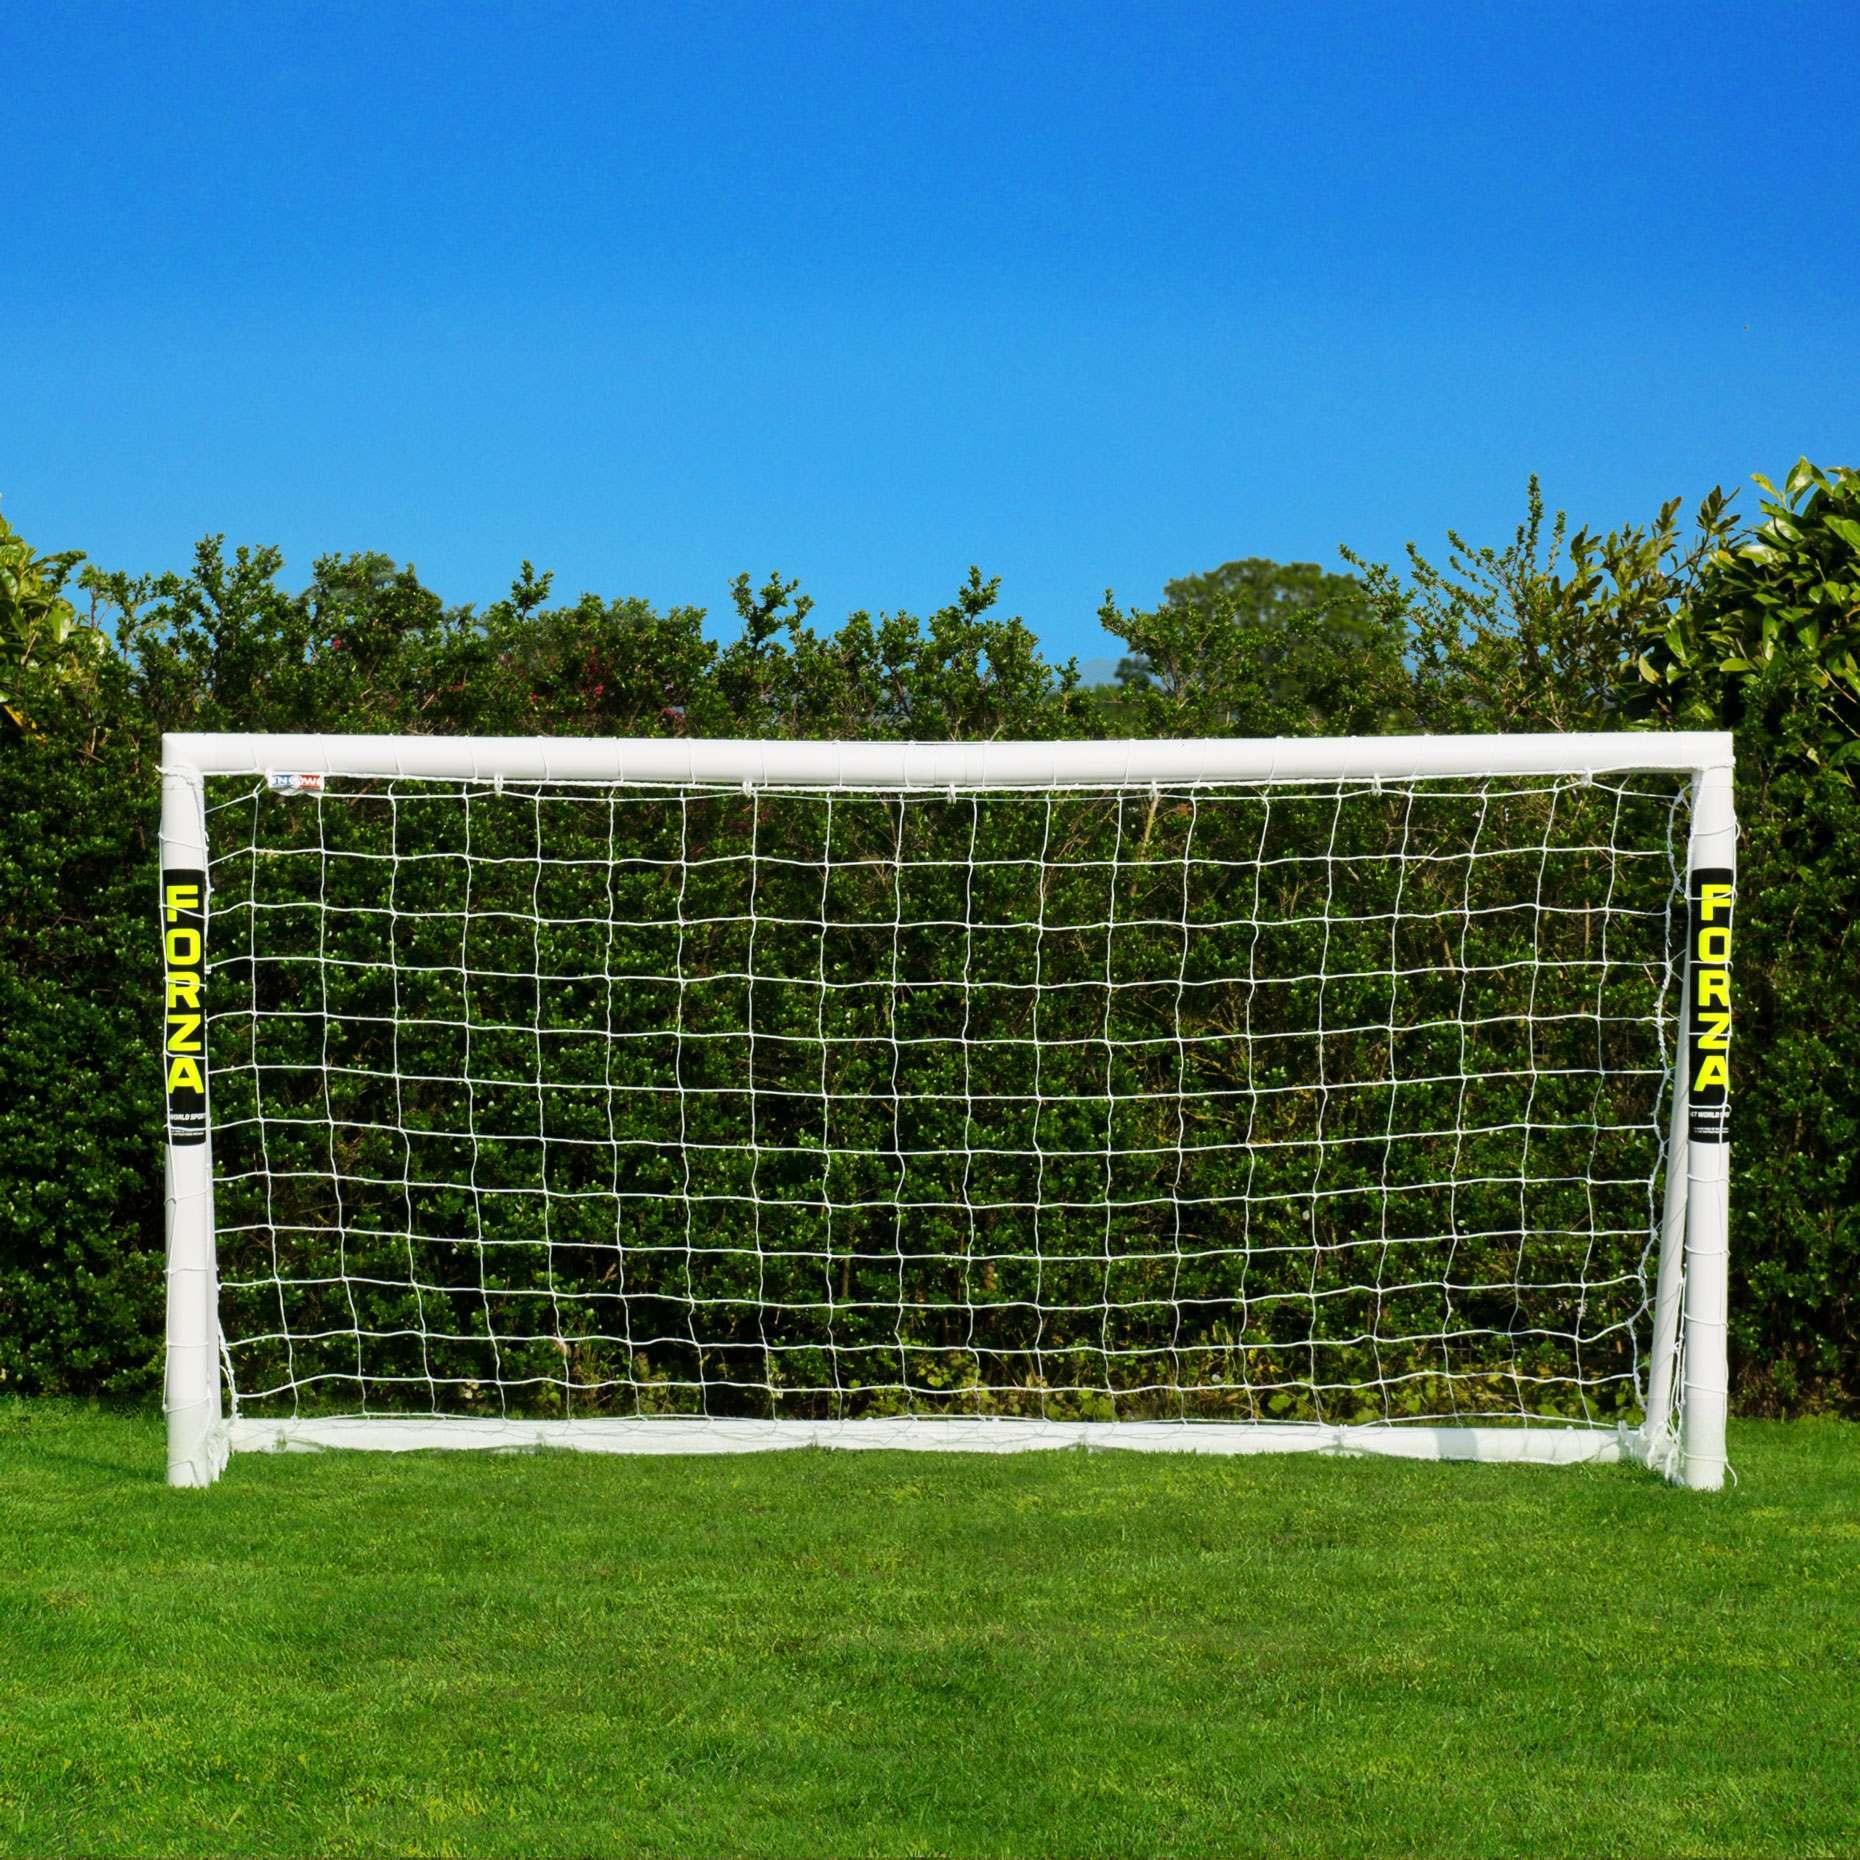 8 x 4 FORZA Football Goal Post